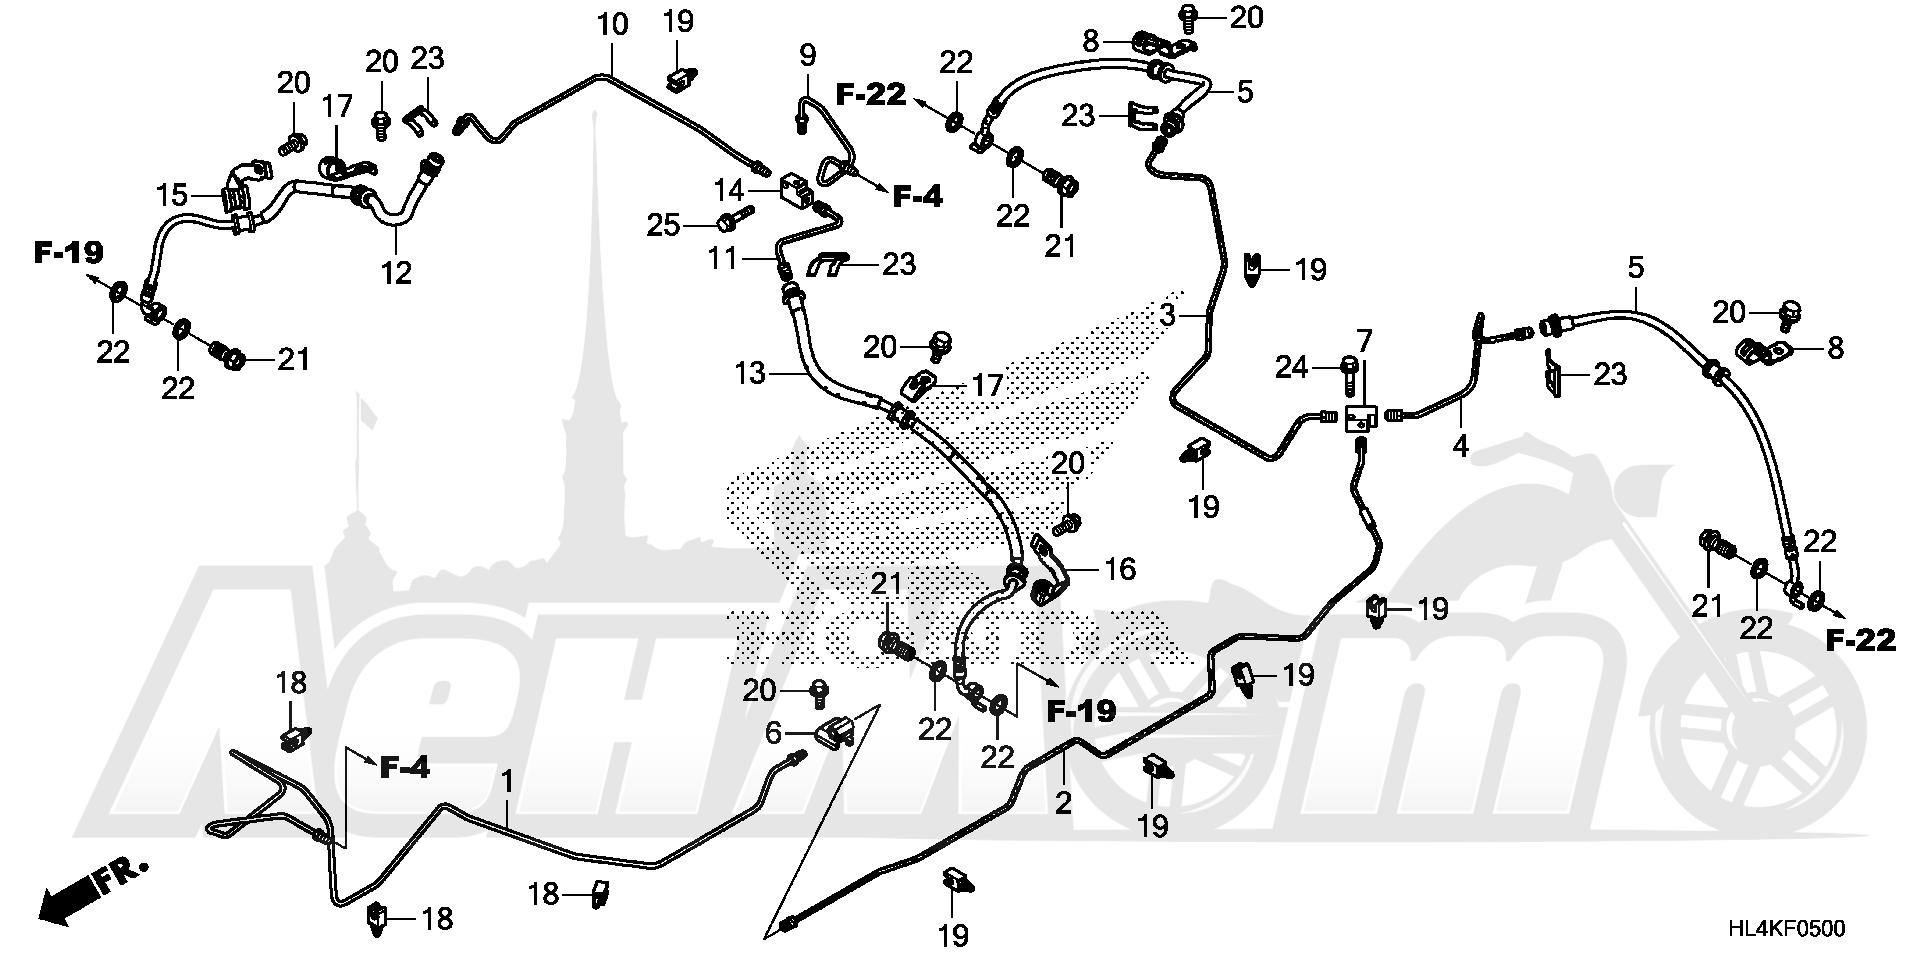 Запчасти для Квадроцикла Honda 2019 SXS1000M3L Раздел: BRAKE PIPE (1) | тормоза труба (1)